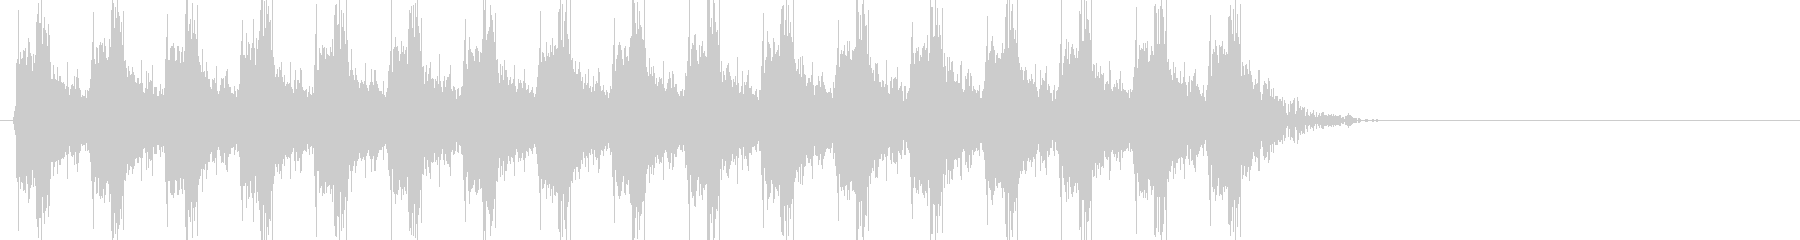 ドドドドドドドドド(銃声、連射)の未再生の波形